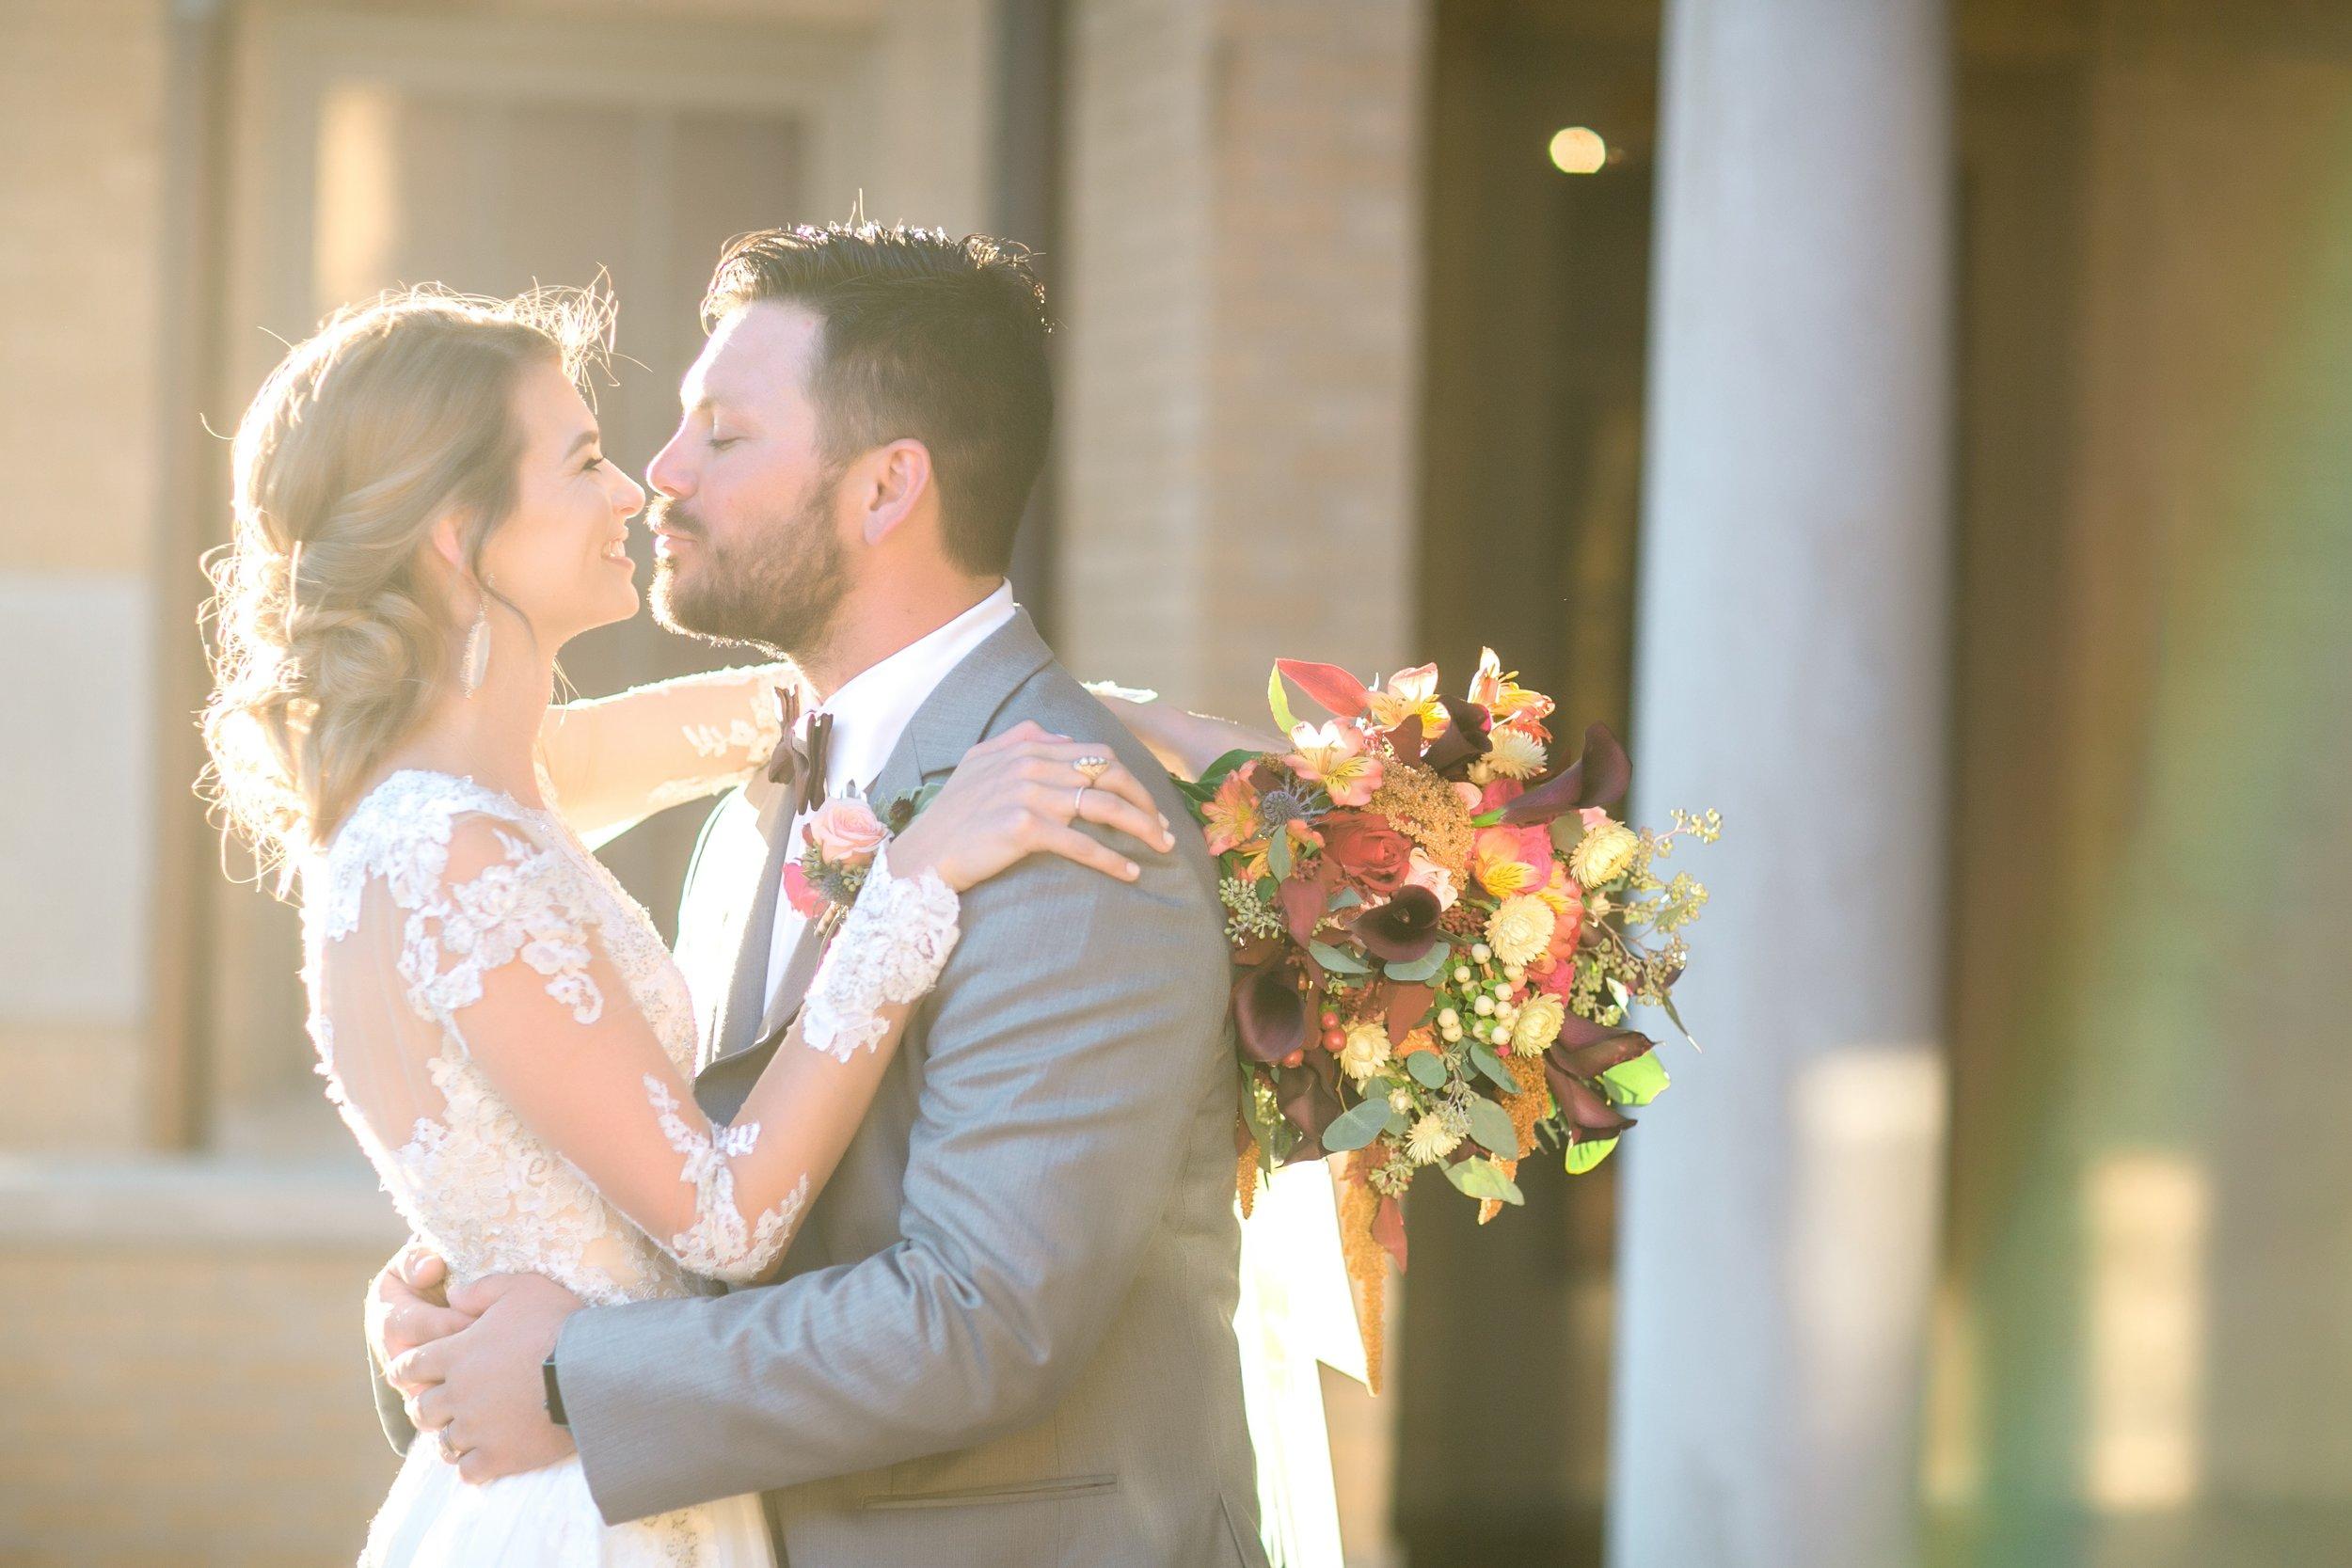 Roberson-Wedding-The-Forum-Lauren-Pinson-Wedding-Photography-Wichita-Falls-Texas-079.jpg